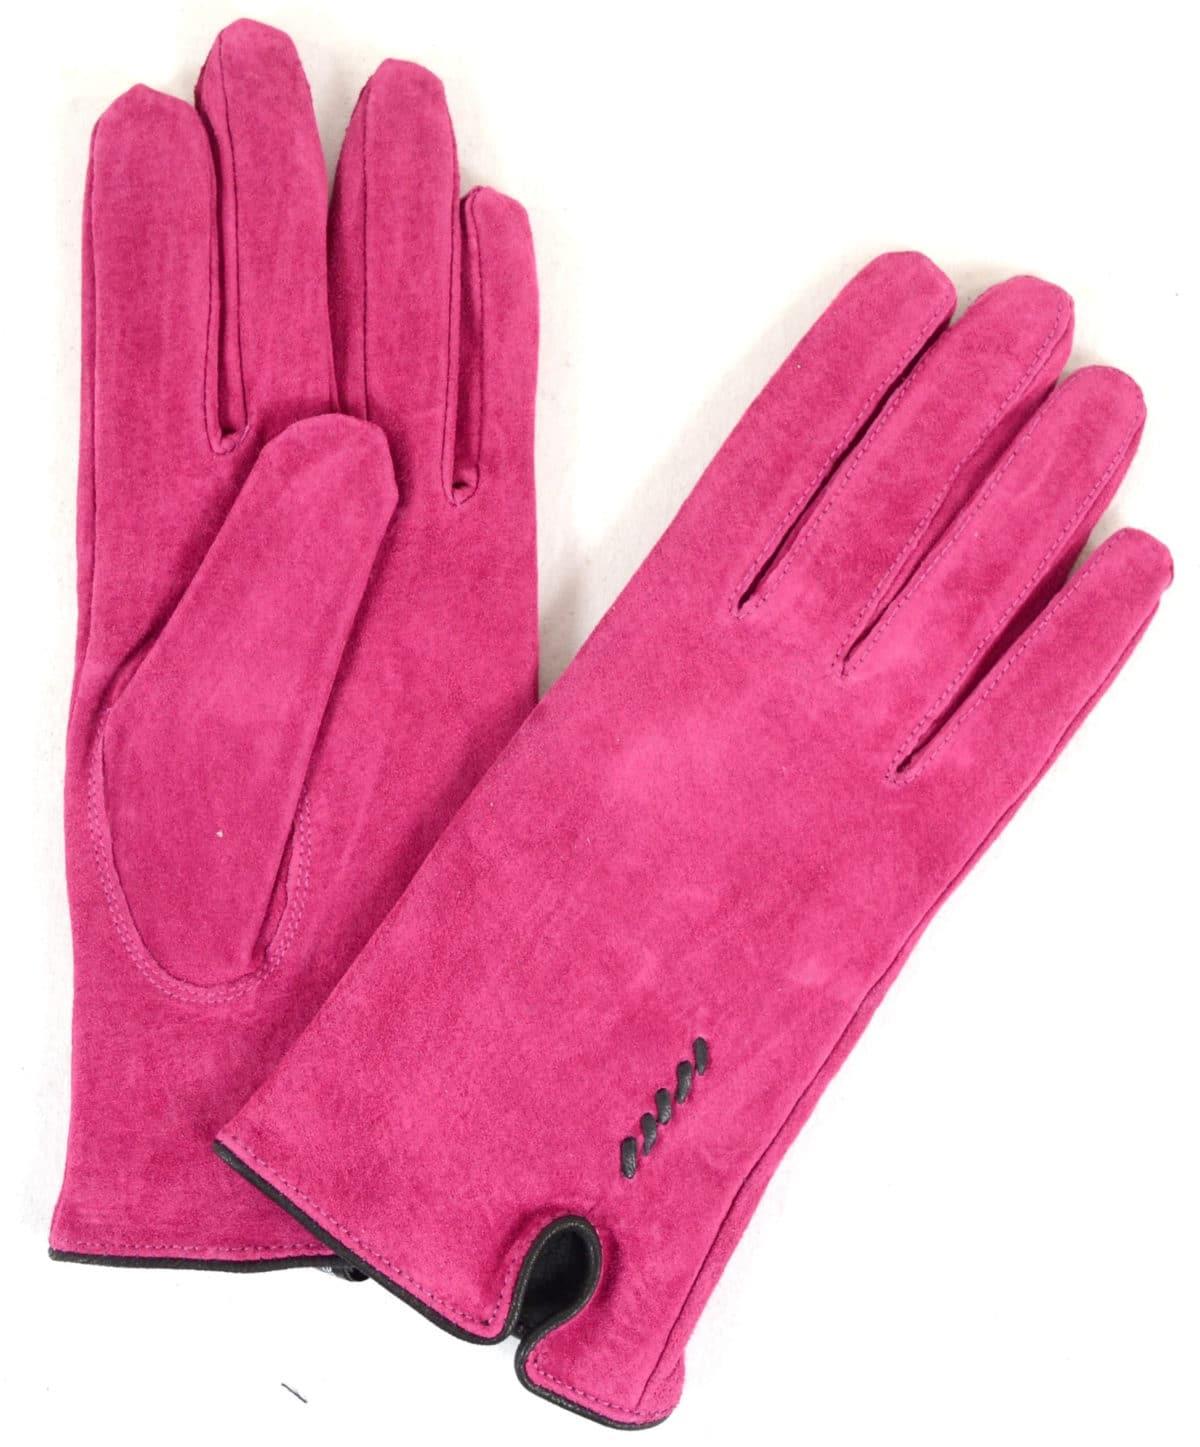 Suede Gloves Fleece Lining and Stitch Design - Pink